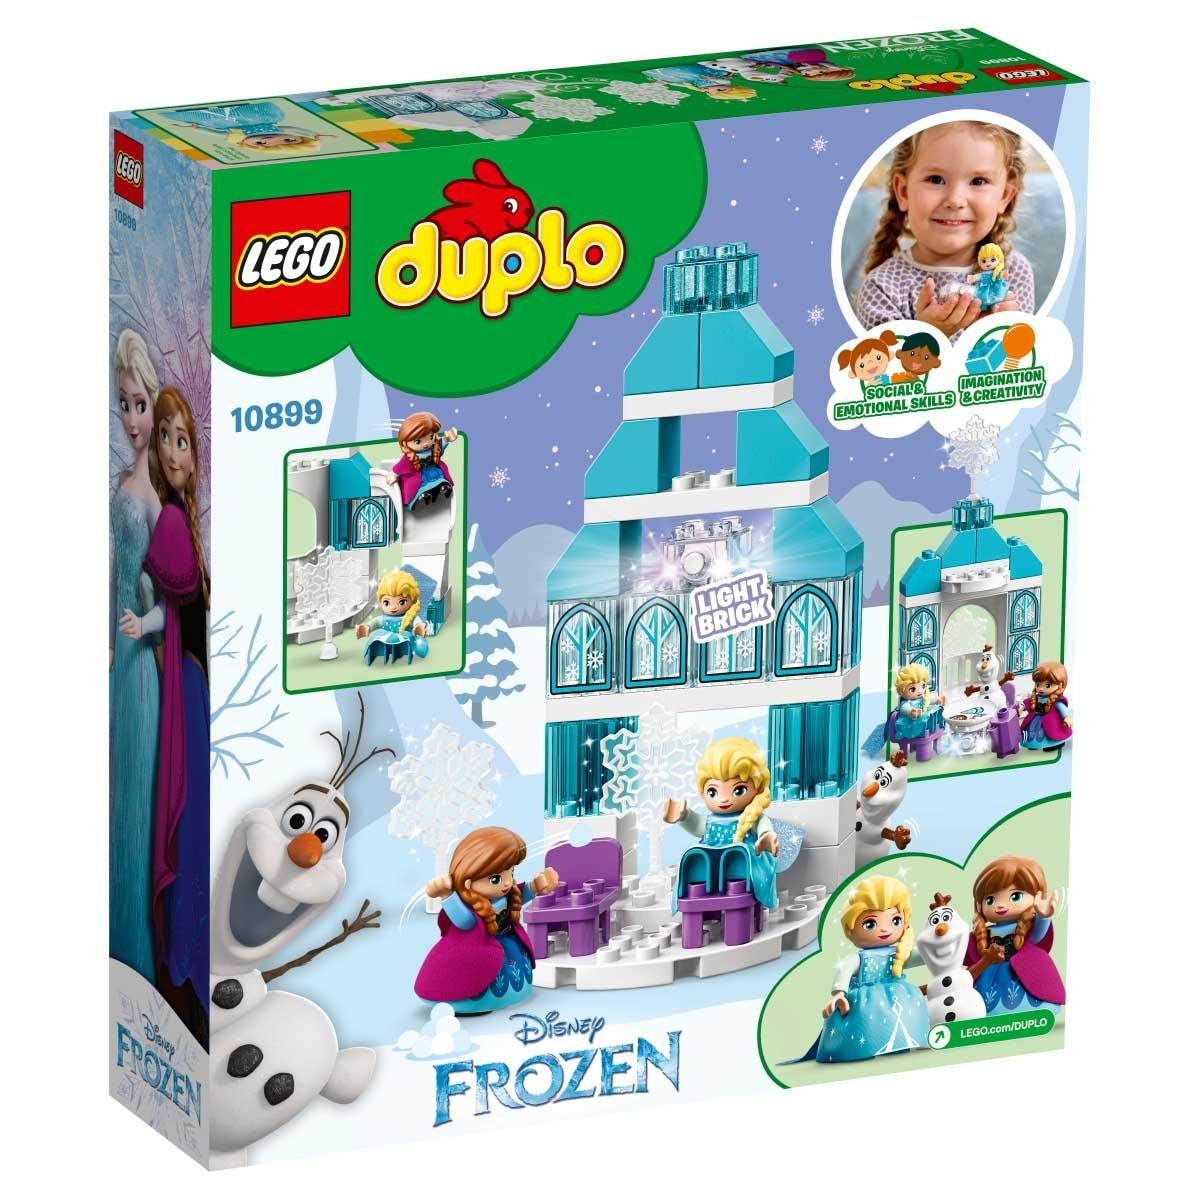 Castillo de Hielo Congelado Lego